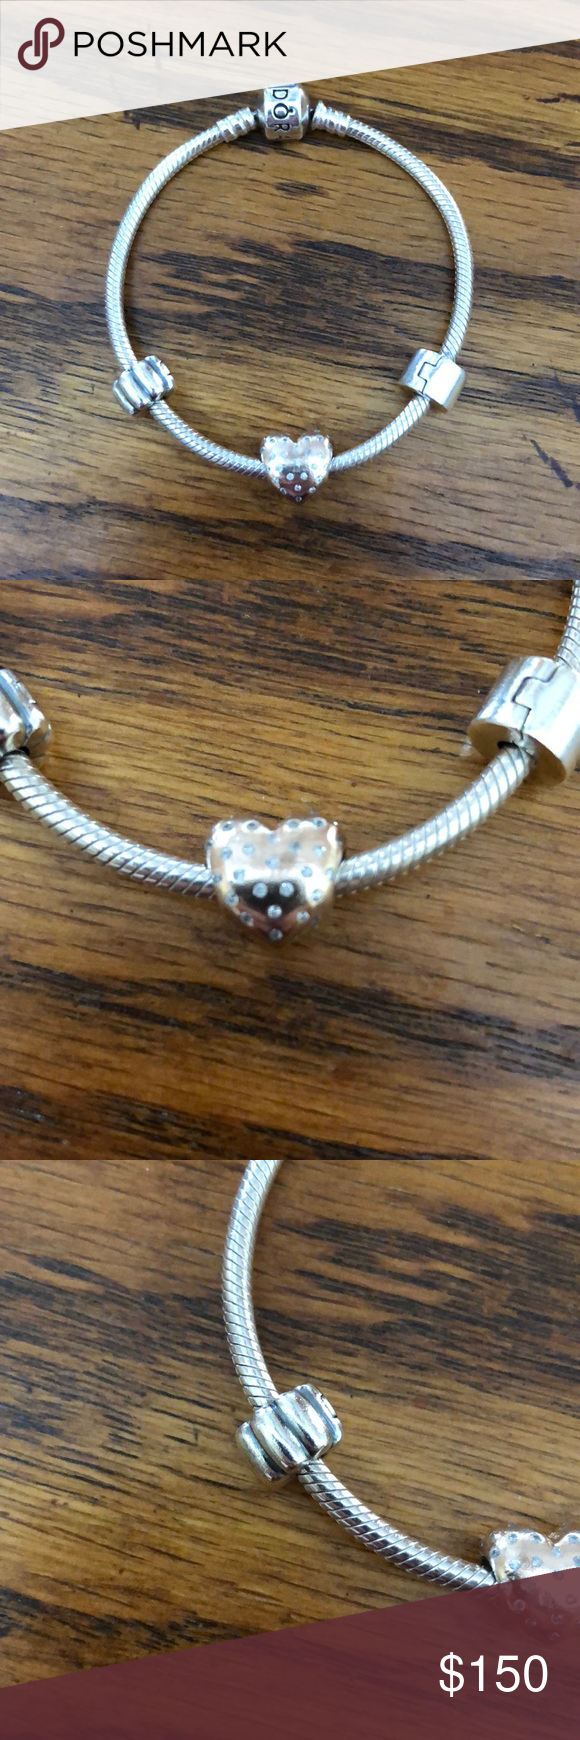 Pandora bracelet with clips charm pandora iconic charm silver